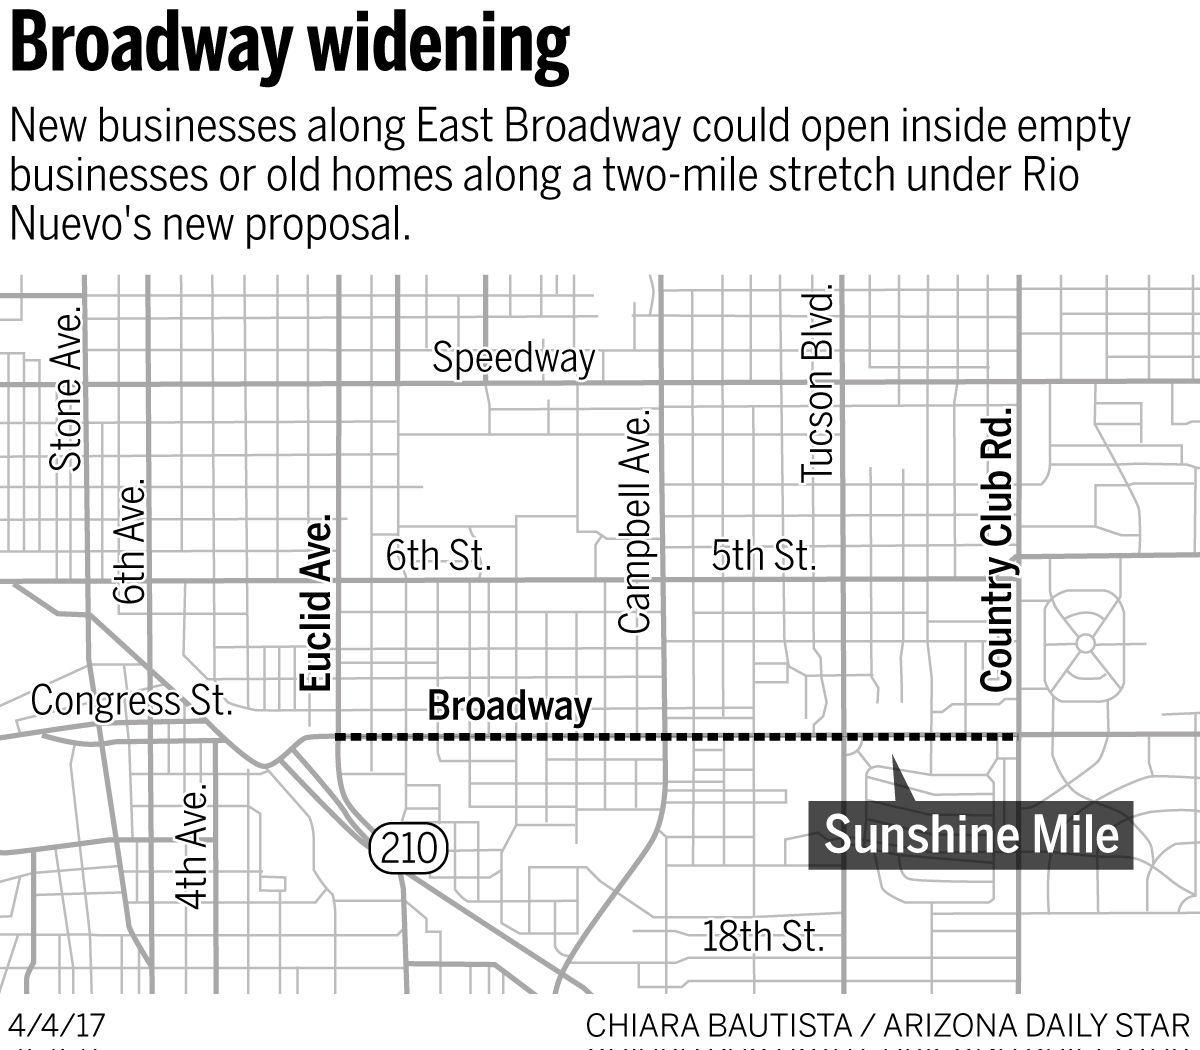 Broadway widening